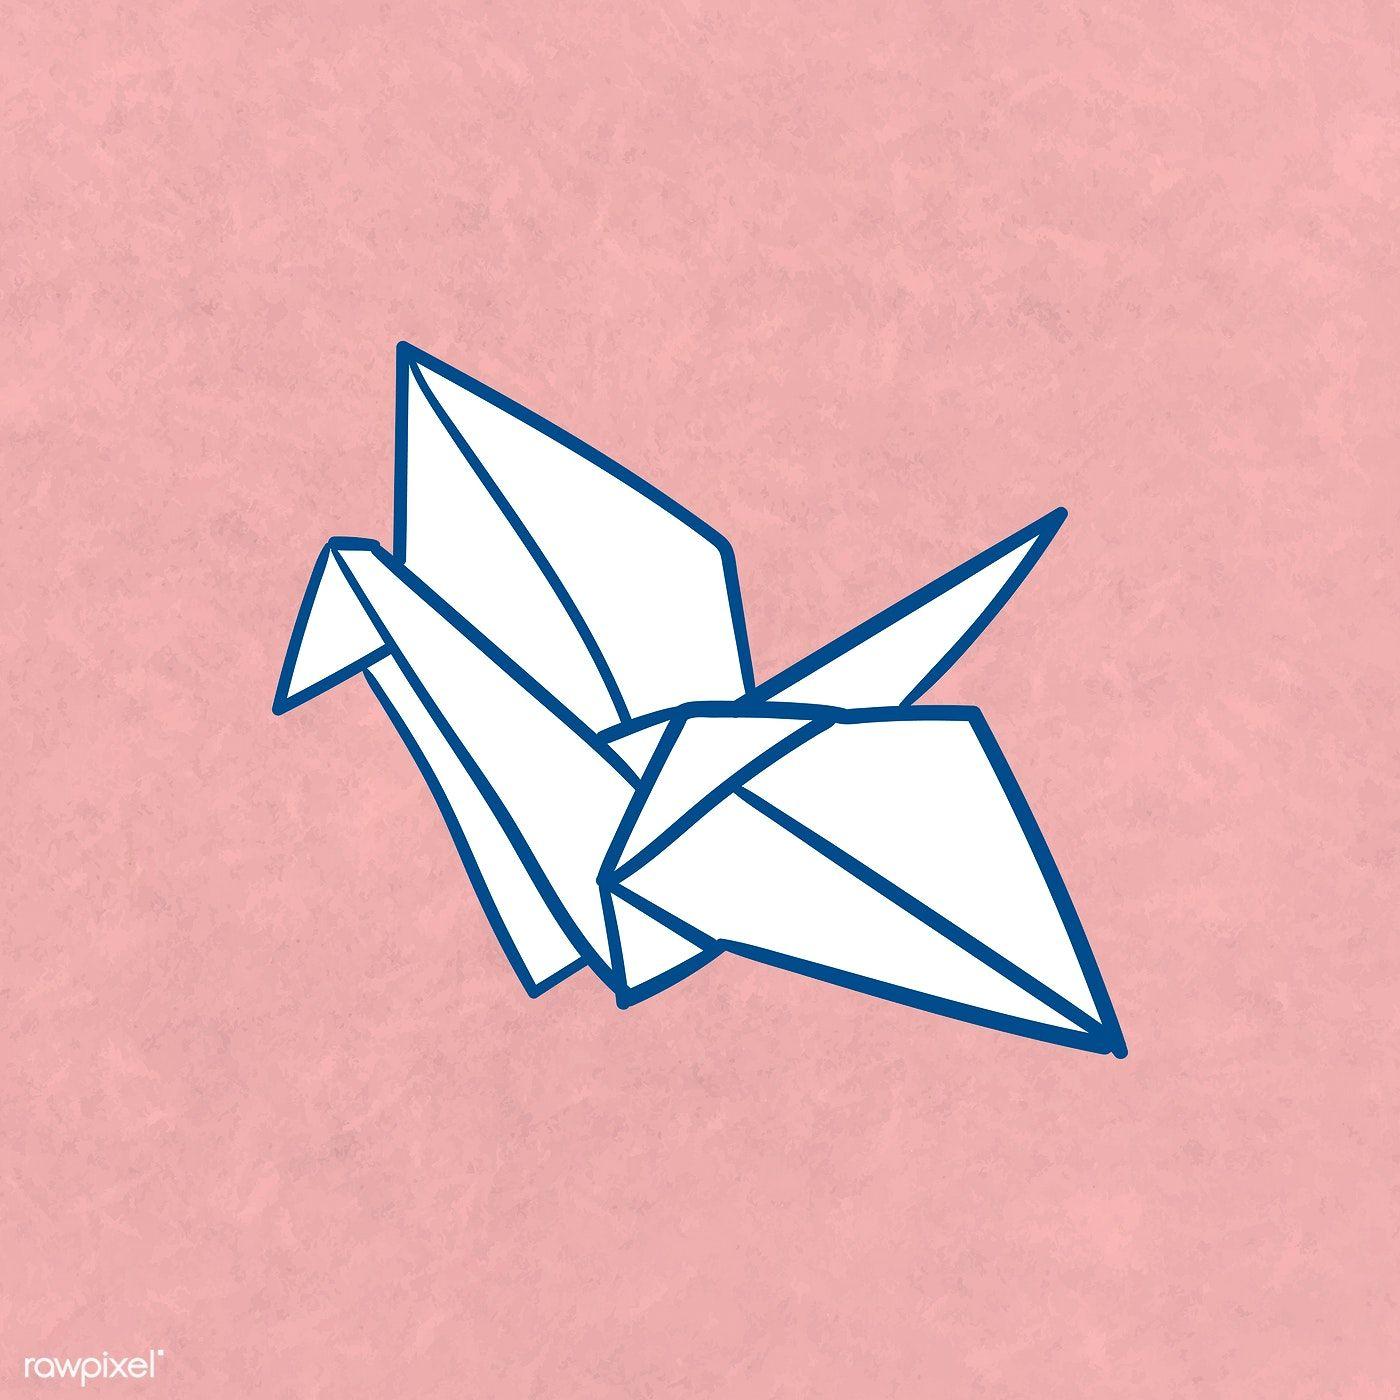 Origami Crane Instructions | 1400x1400